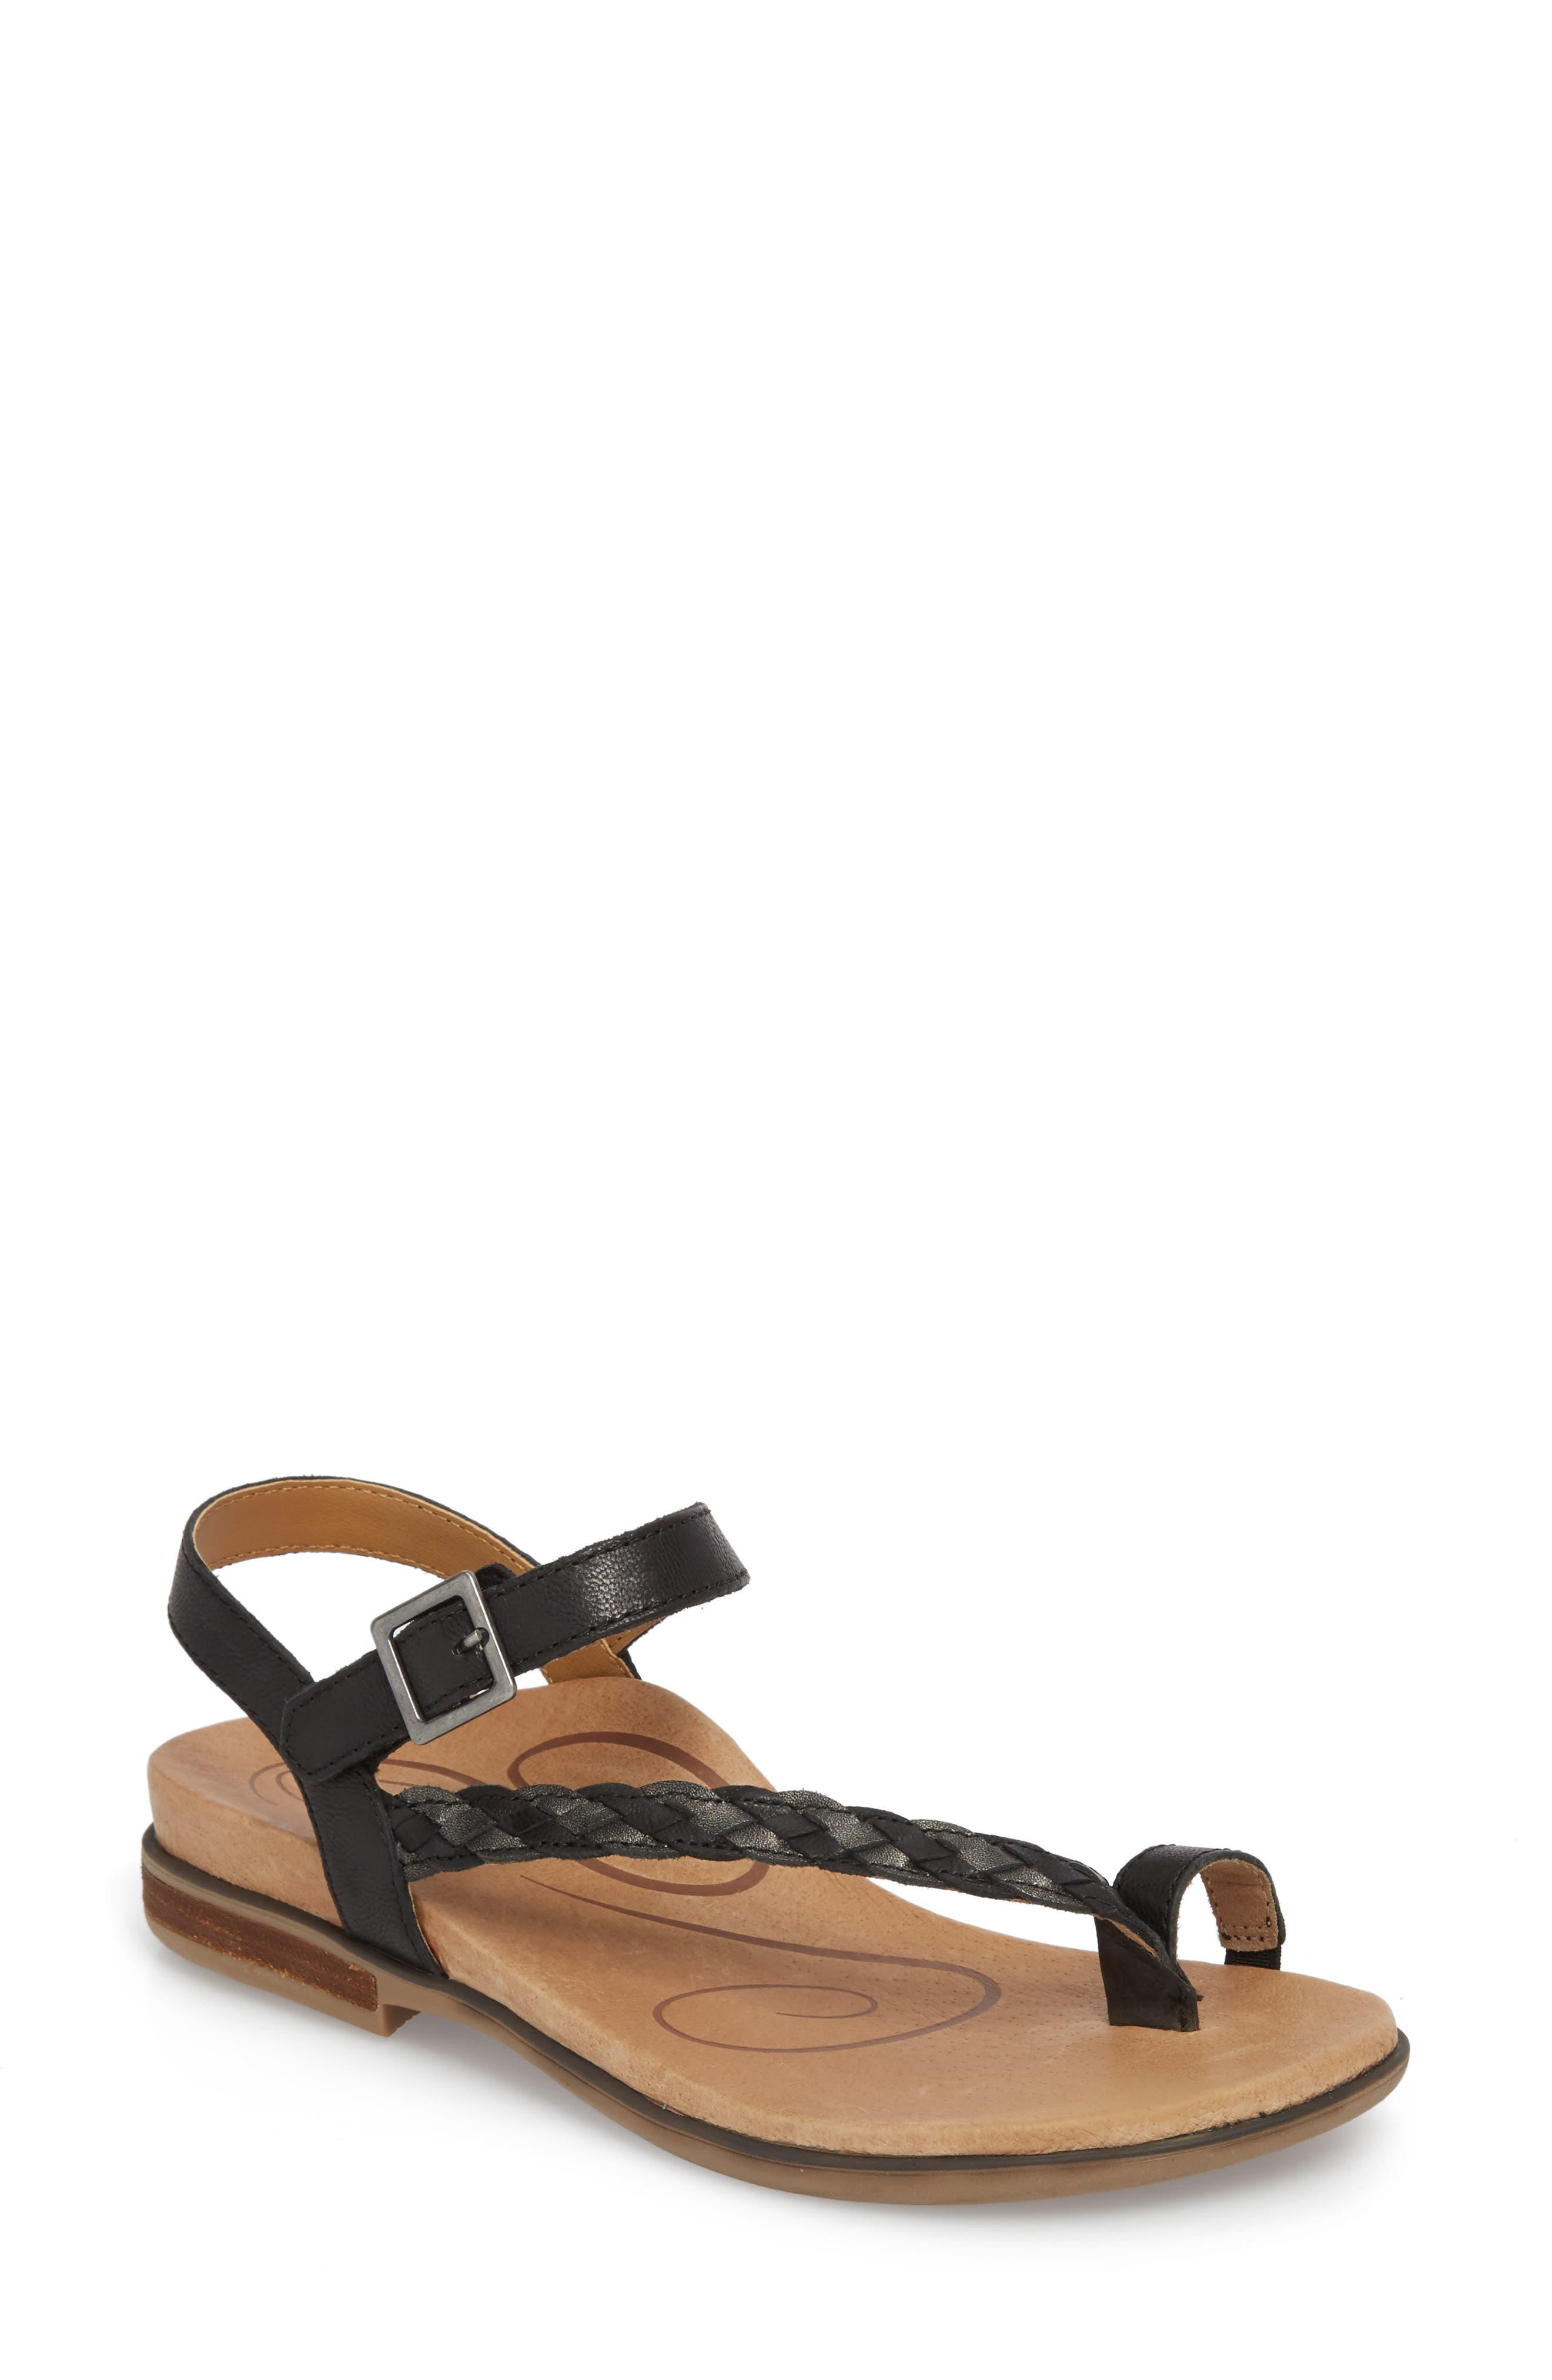 AETREX Evie Braided Strap Sandal, Main, color, BLACK LEATHER